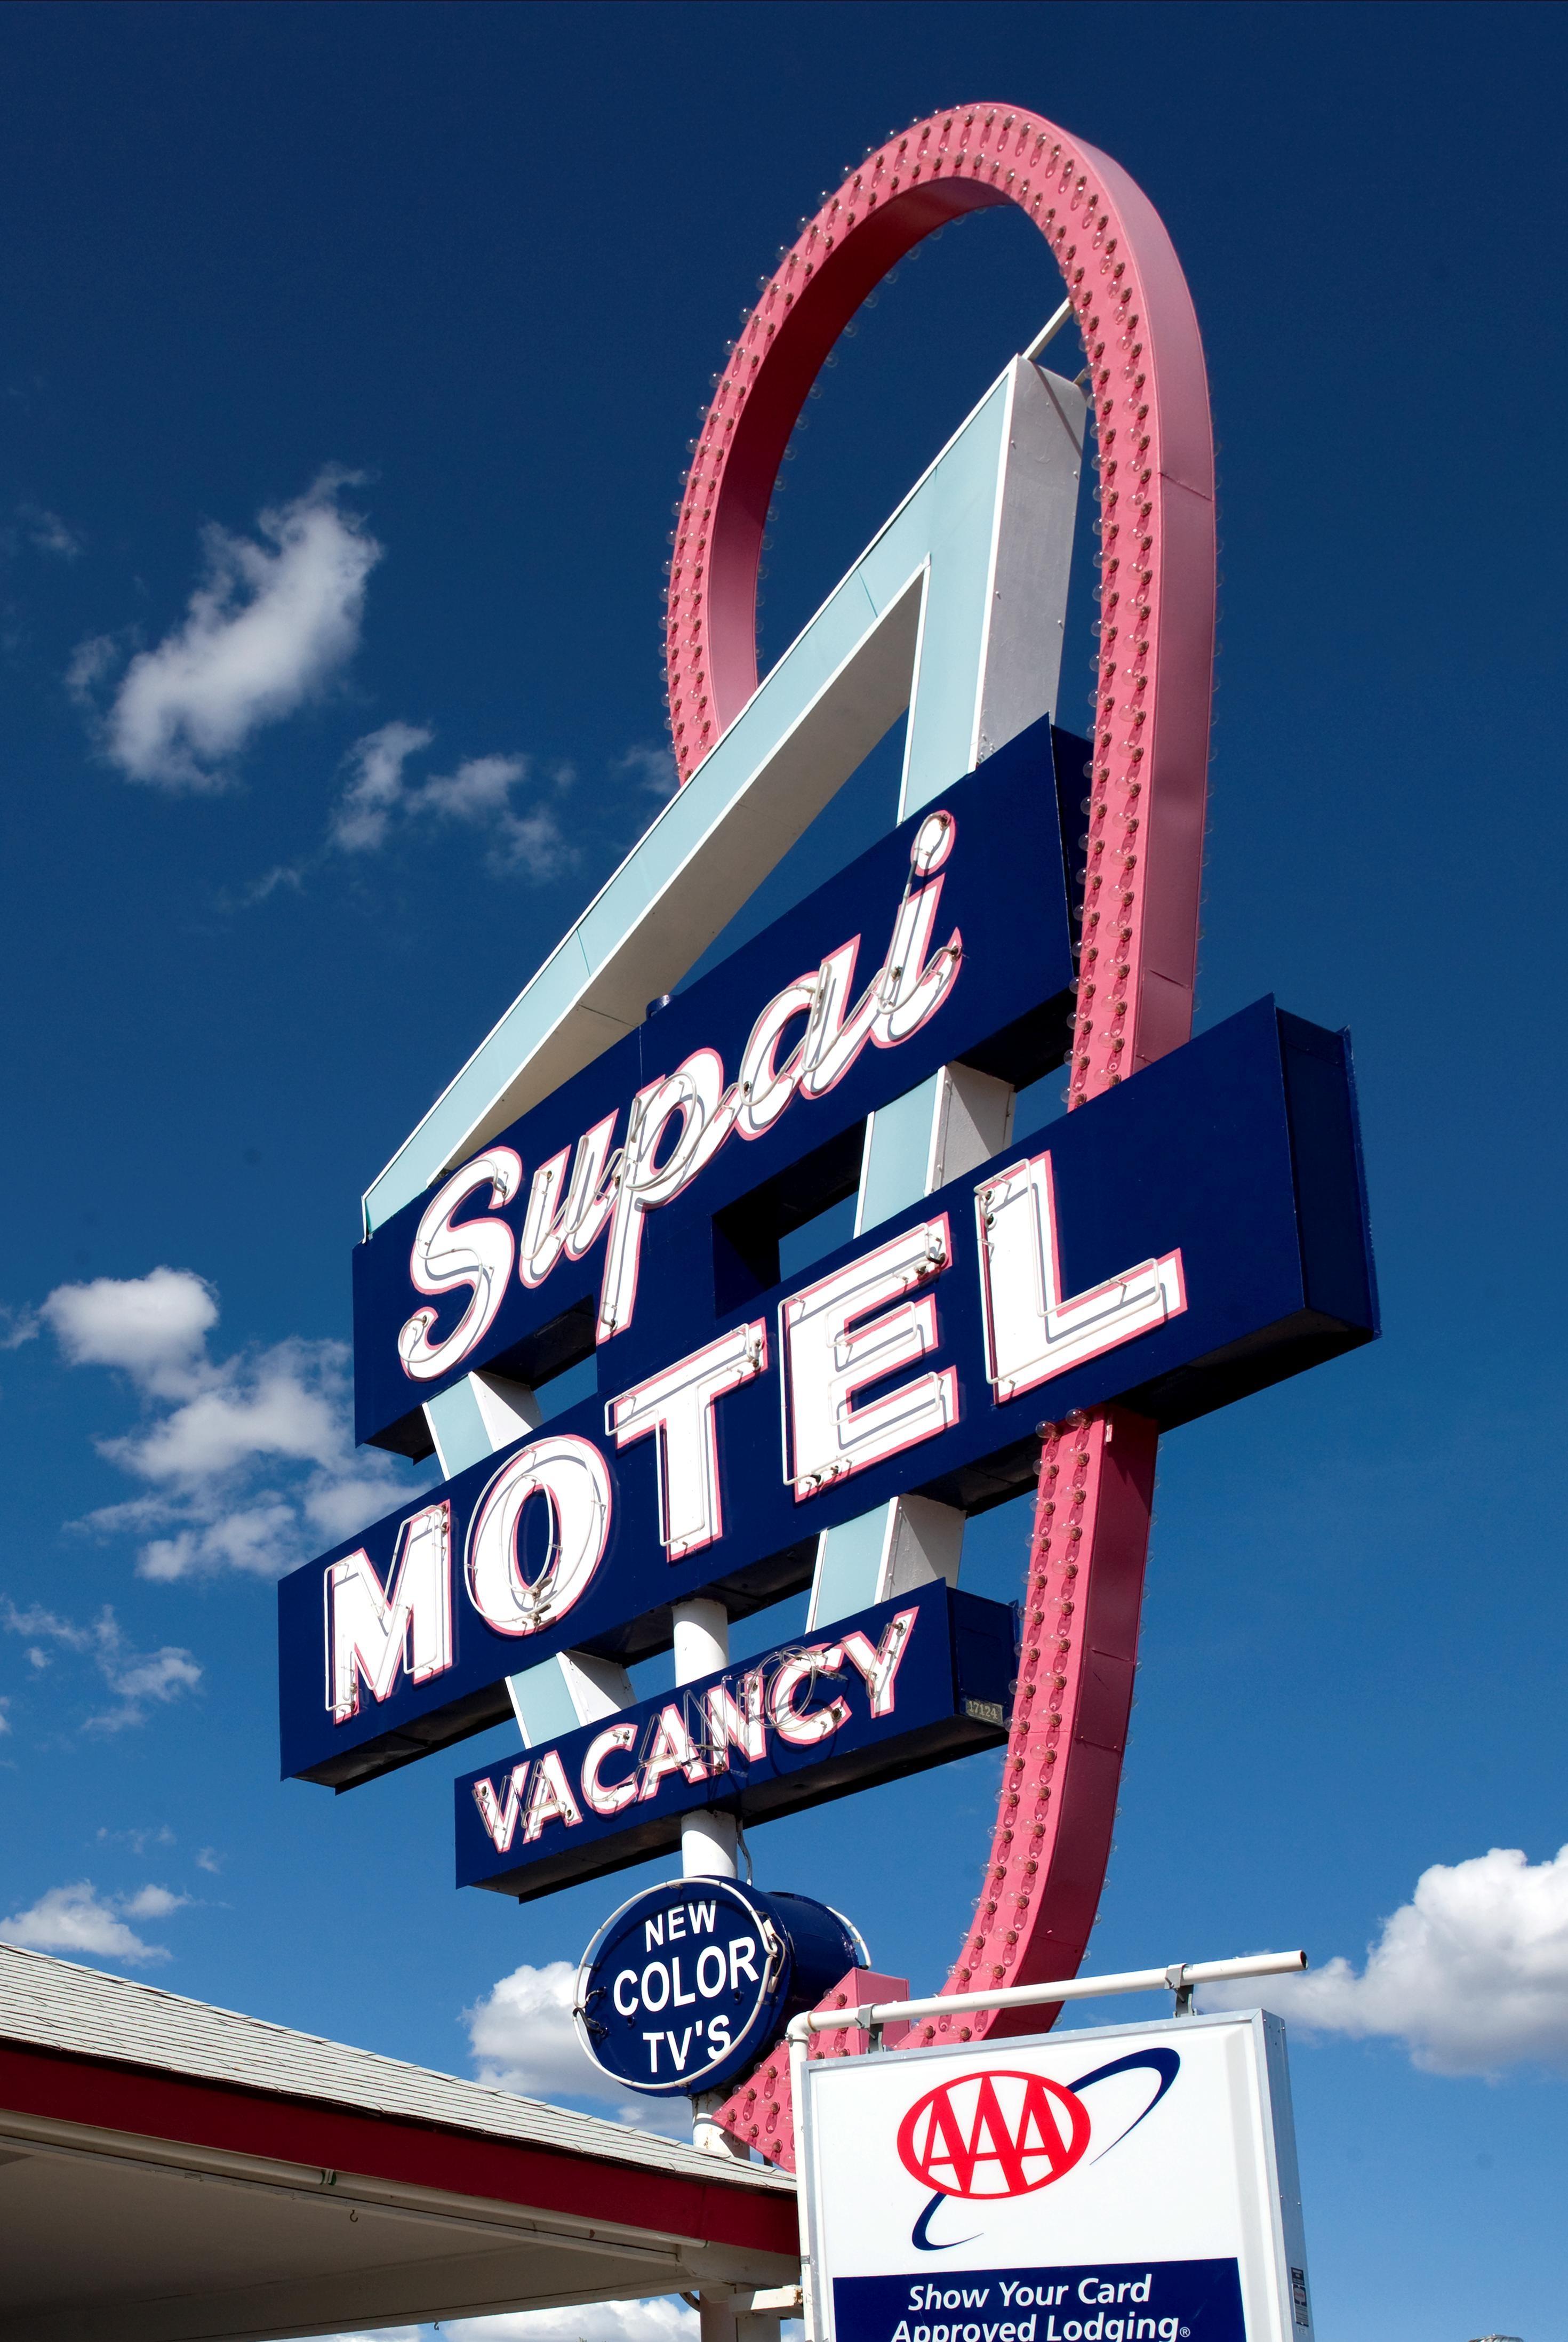 Supai Motel, Sign, Object, Motel, Hotel, HQ Photo